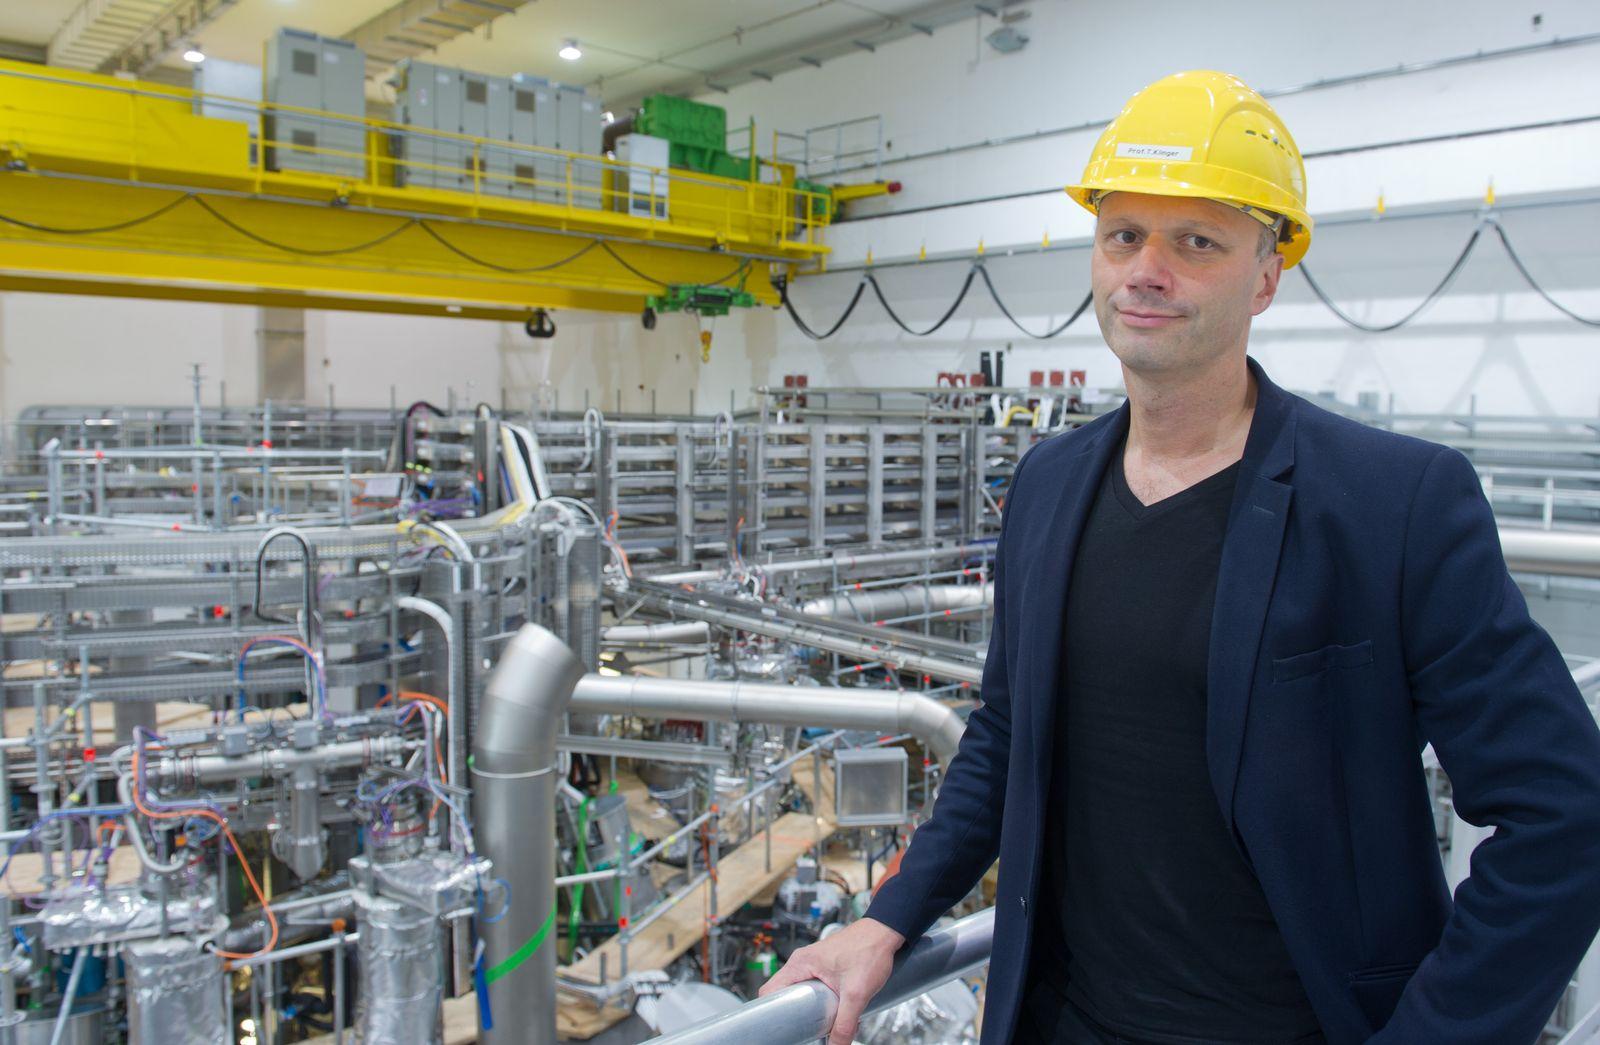 Wendelstein 7X/ Kernfusions-Testanlage/ Thomas Klinger